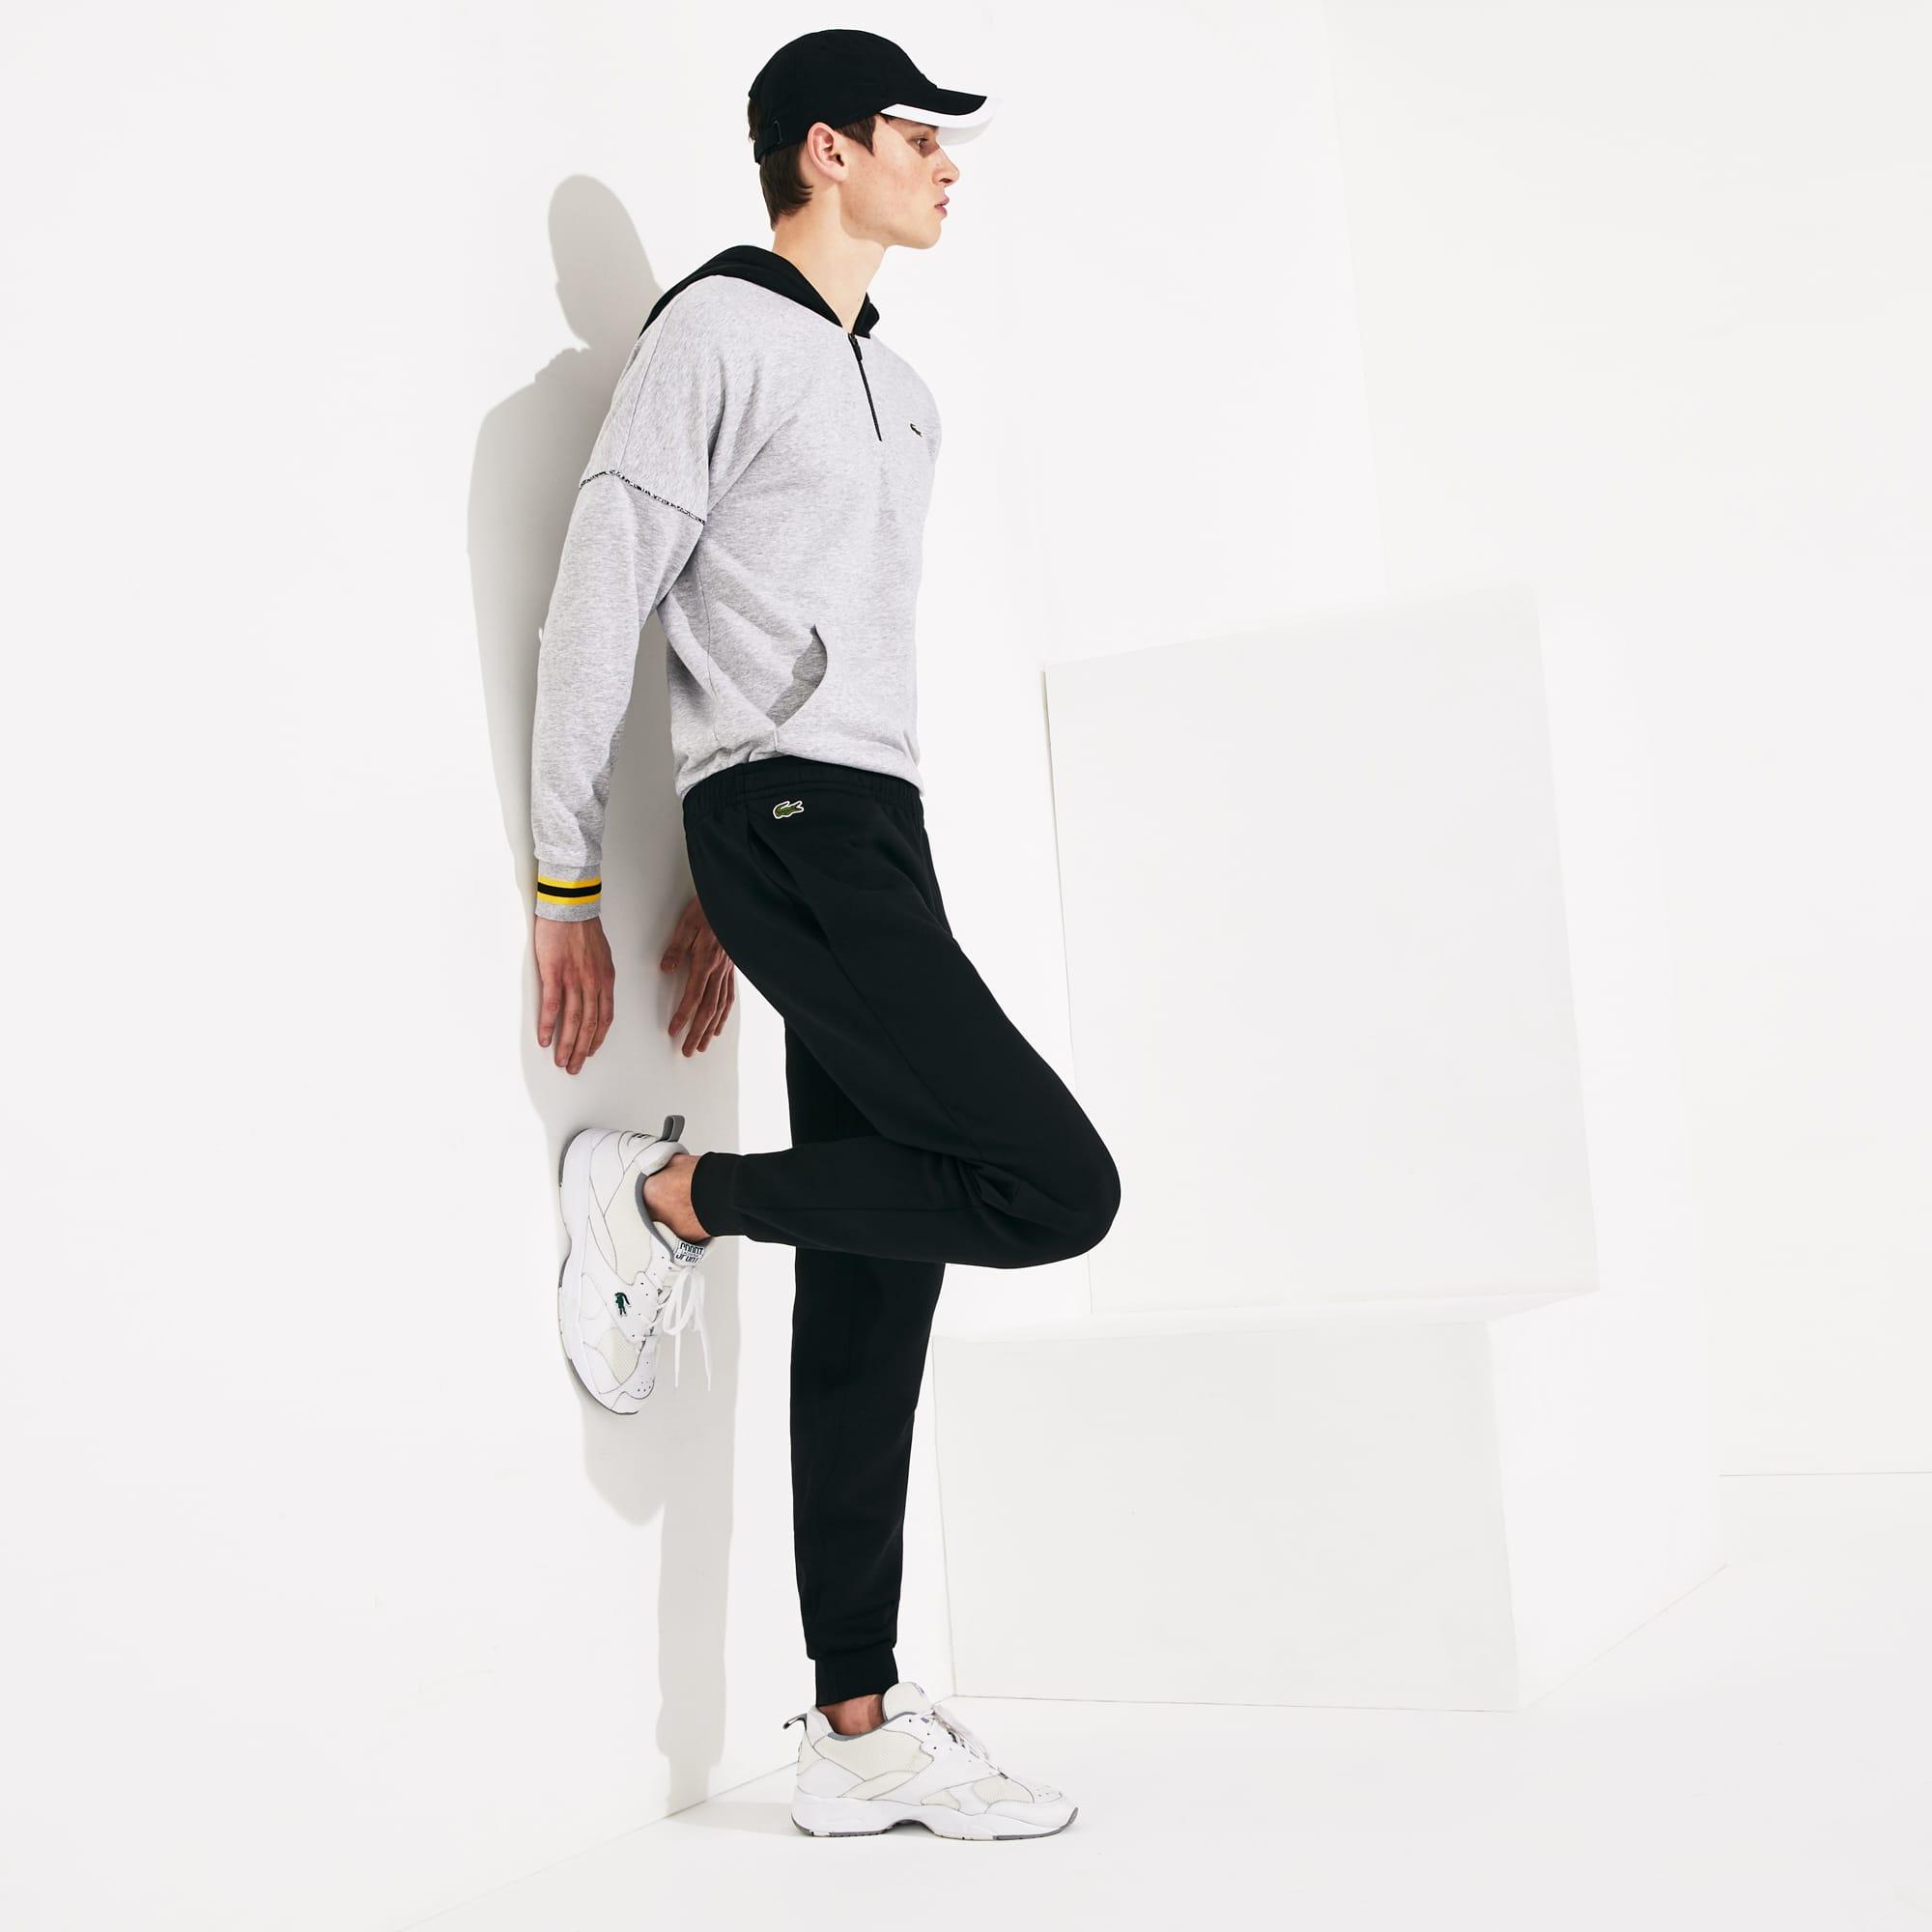 Herren-Trainingshose aus Baumwollfleece LACOSTESPORT TENNIS